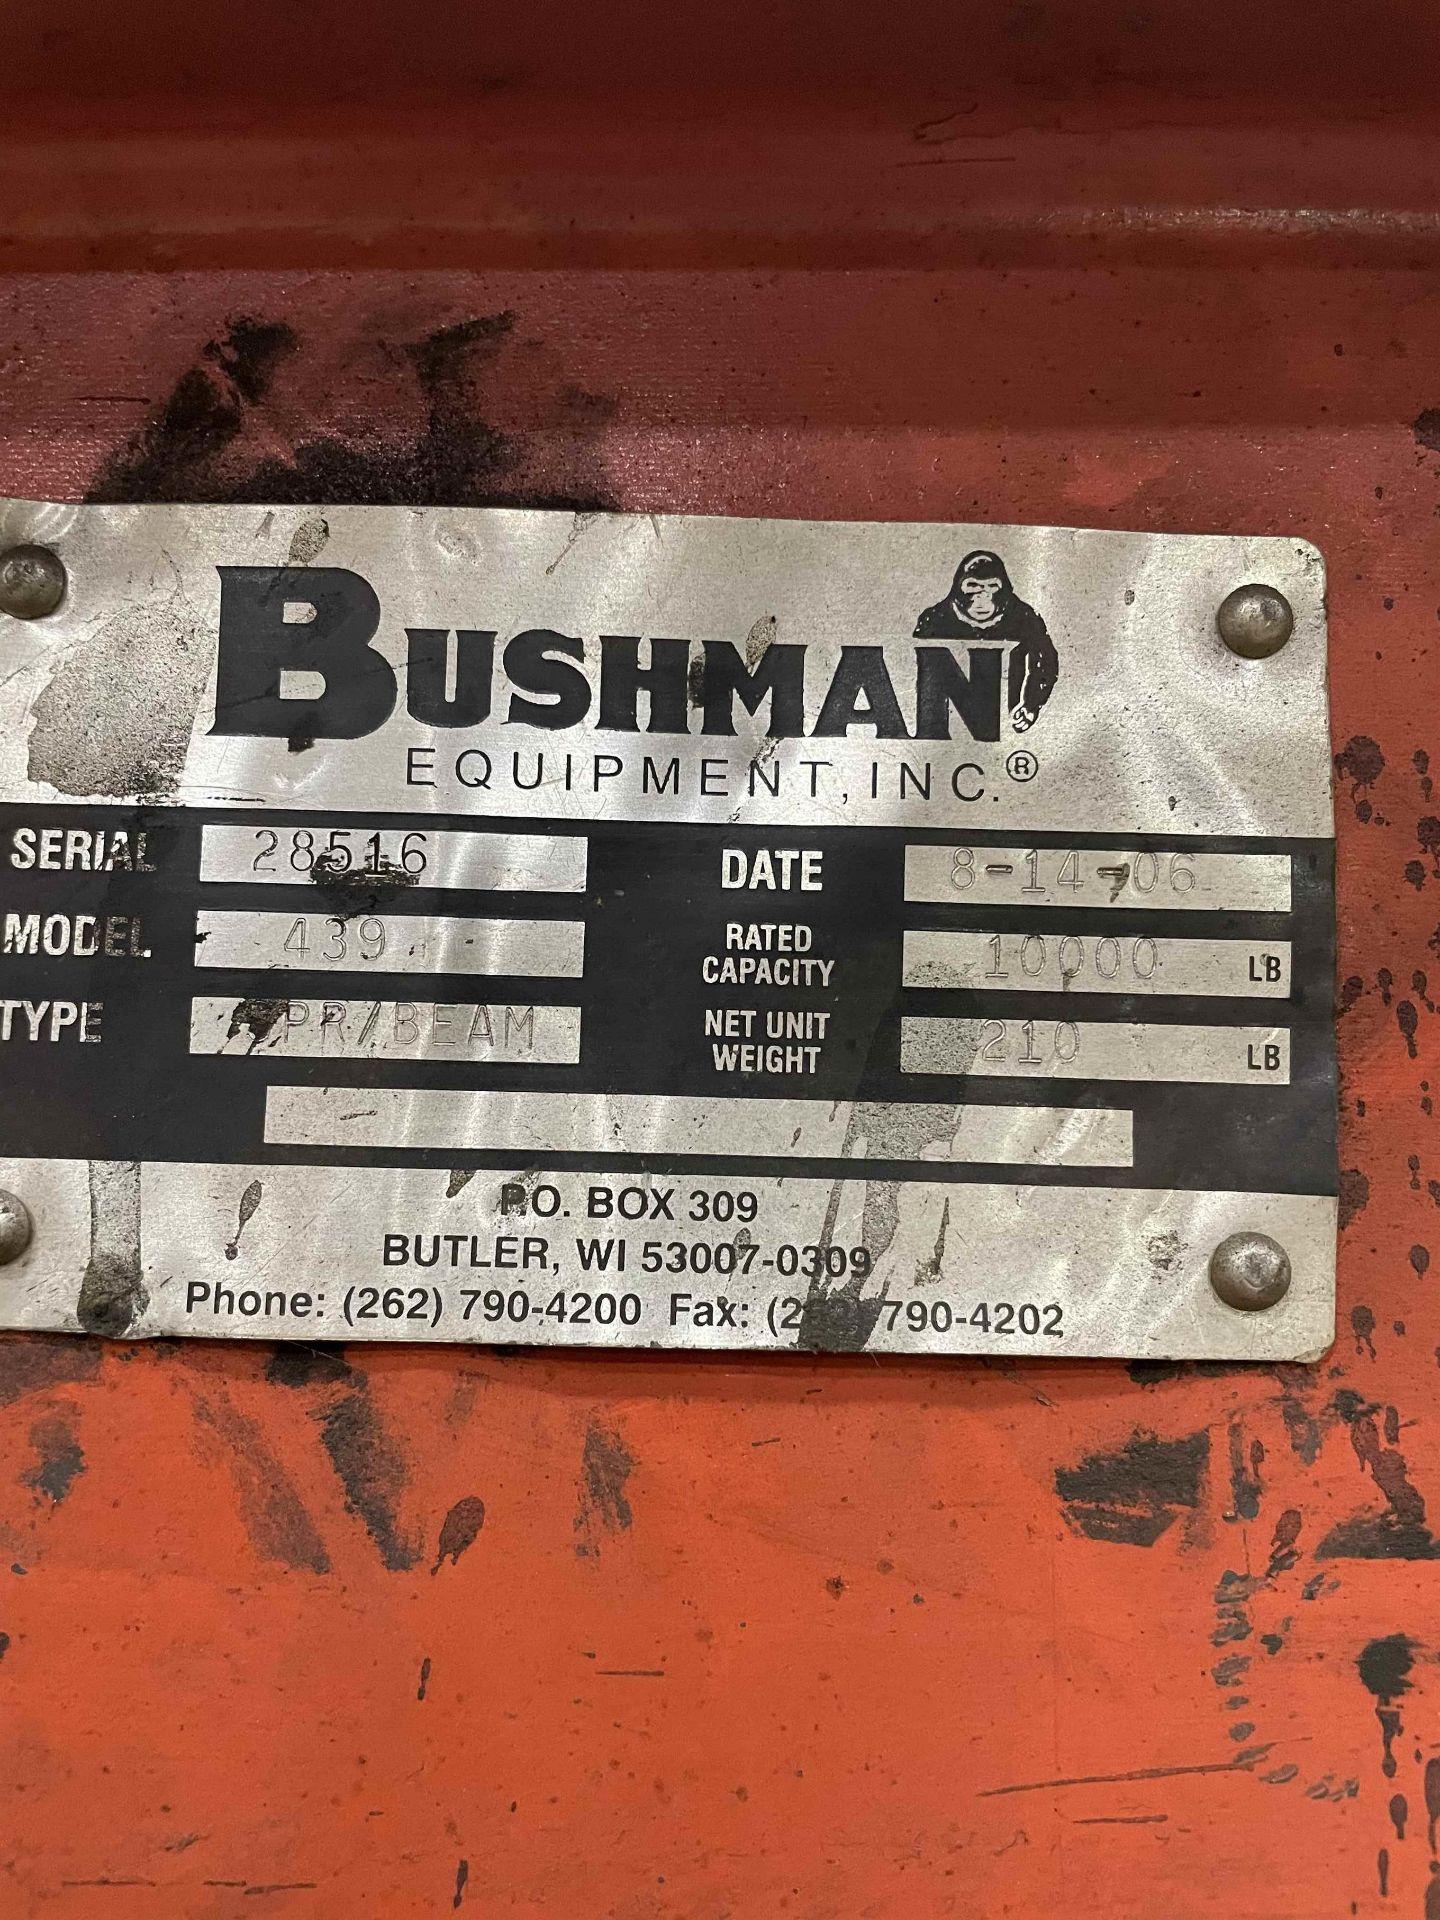 2006 BUSHMAN 439 5-Ton Spreader Beam, s/n 28516, 6'L - Image 2 of 2